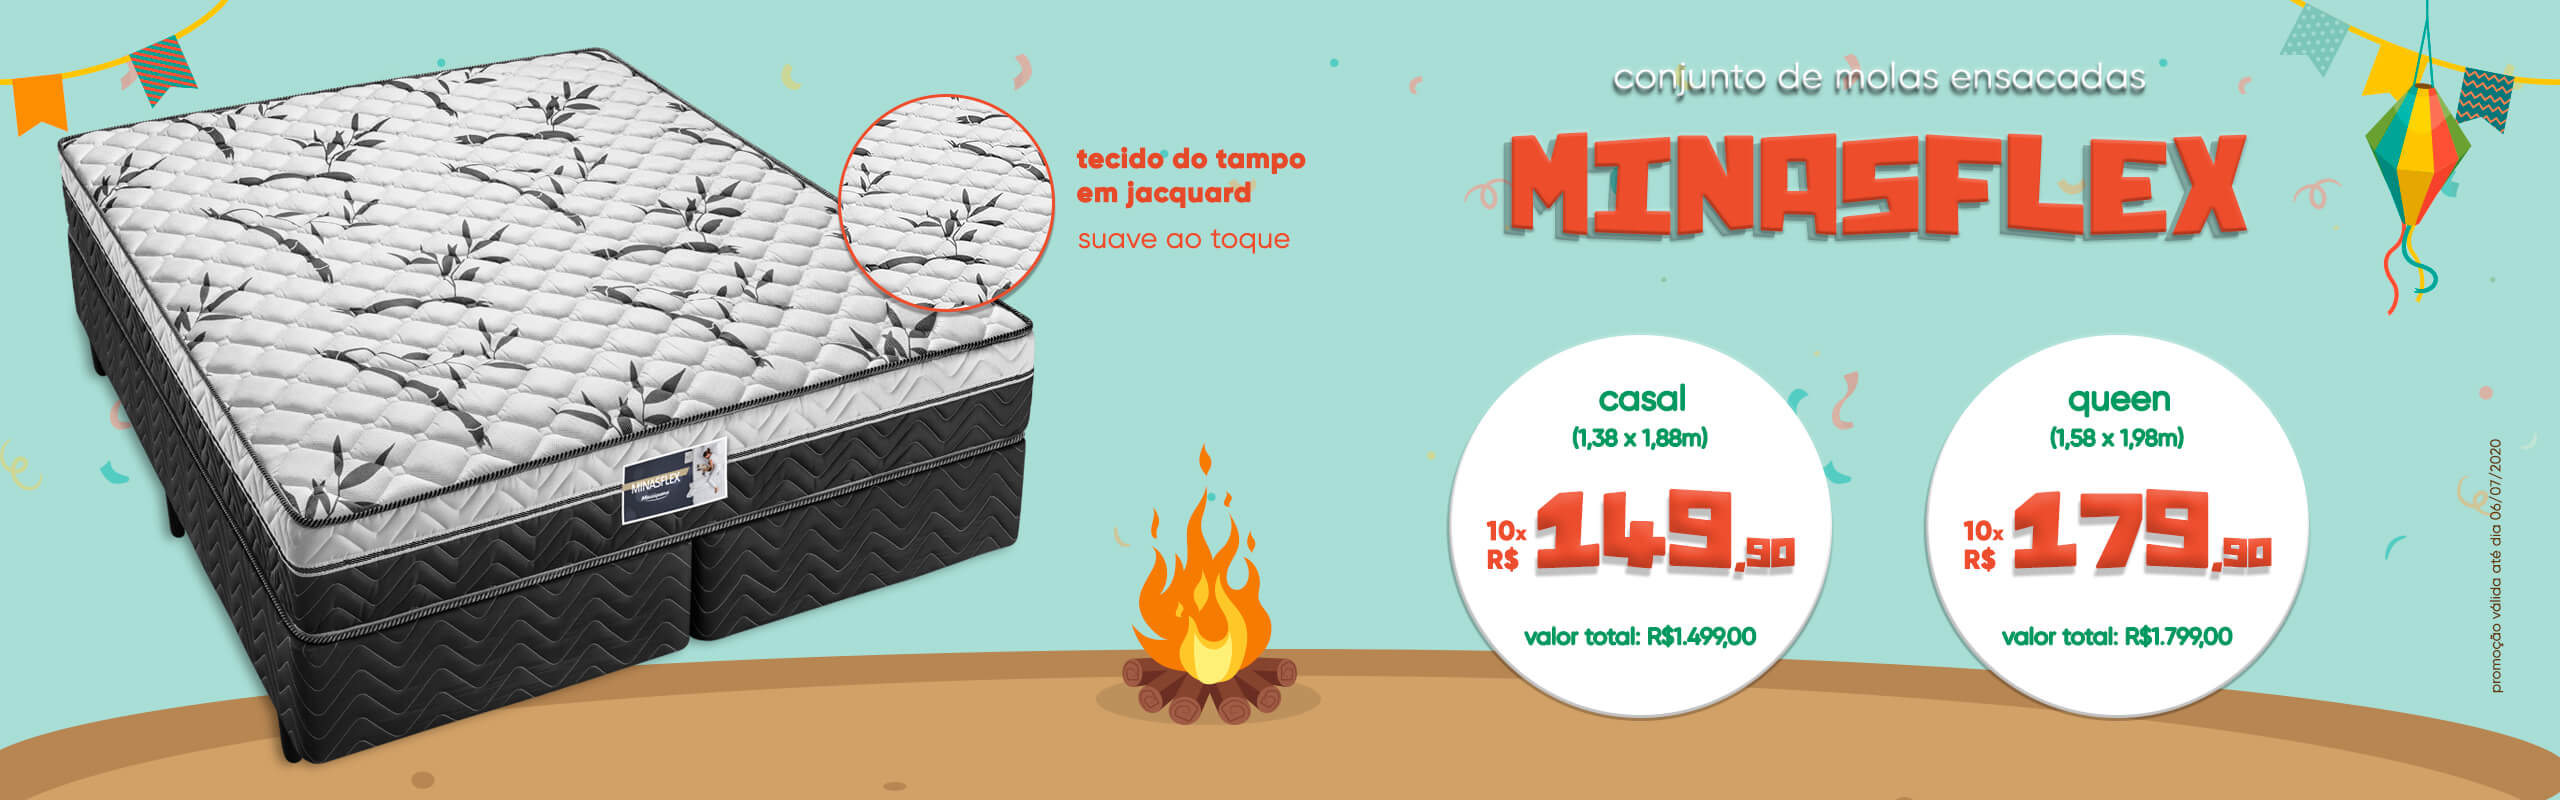 Minasflex - Renove seu conforto